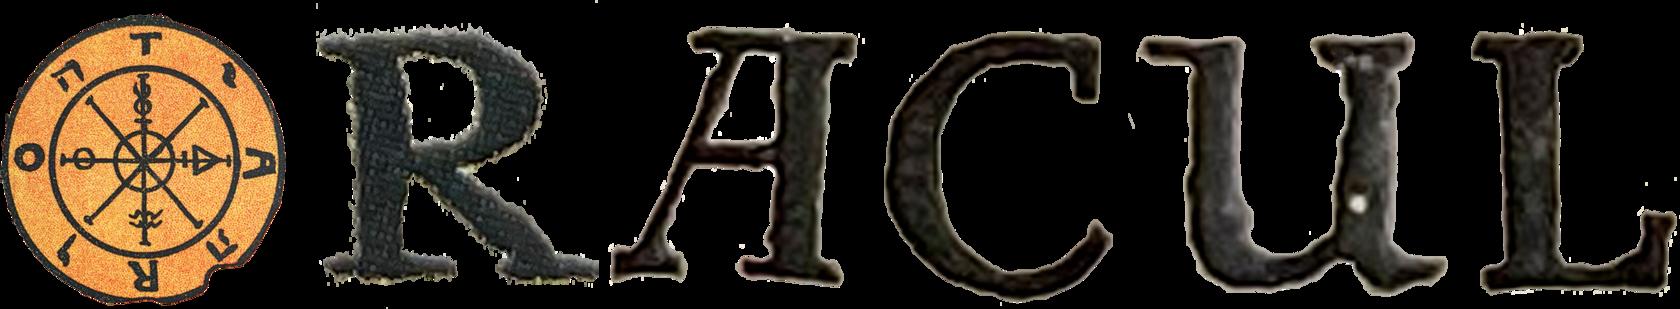 EZO эксперт